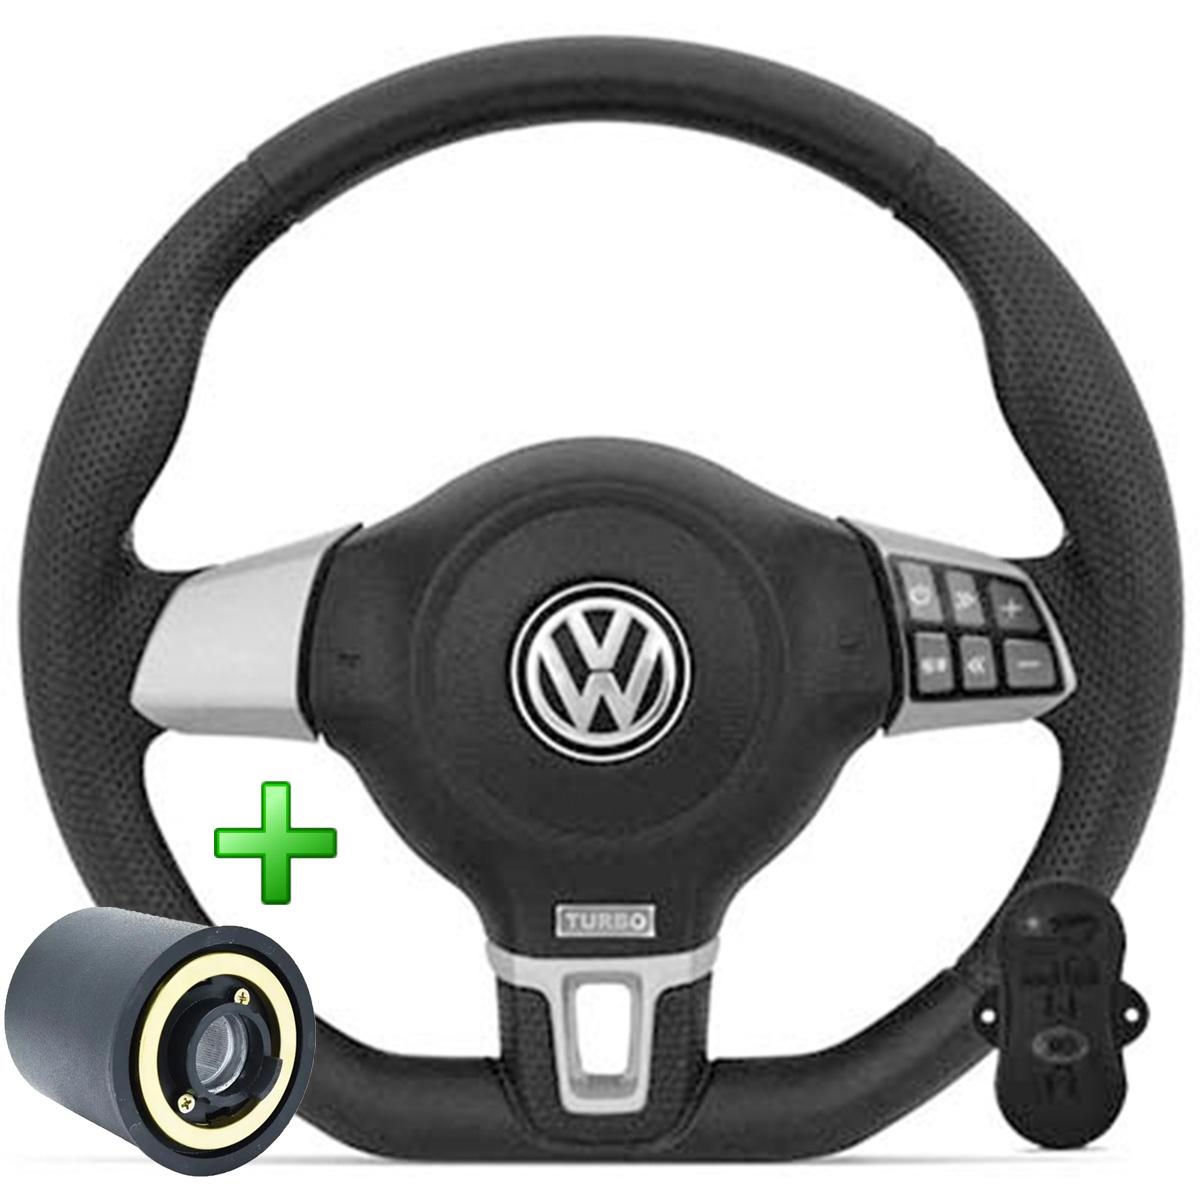 Volante Com Comando Volkswagen Jetta Base Reta Esportivo Cubo Golf Saveiro Parati Poliparts